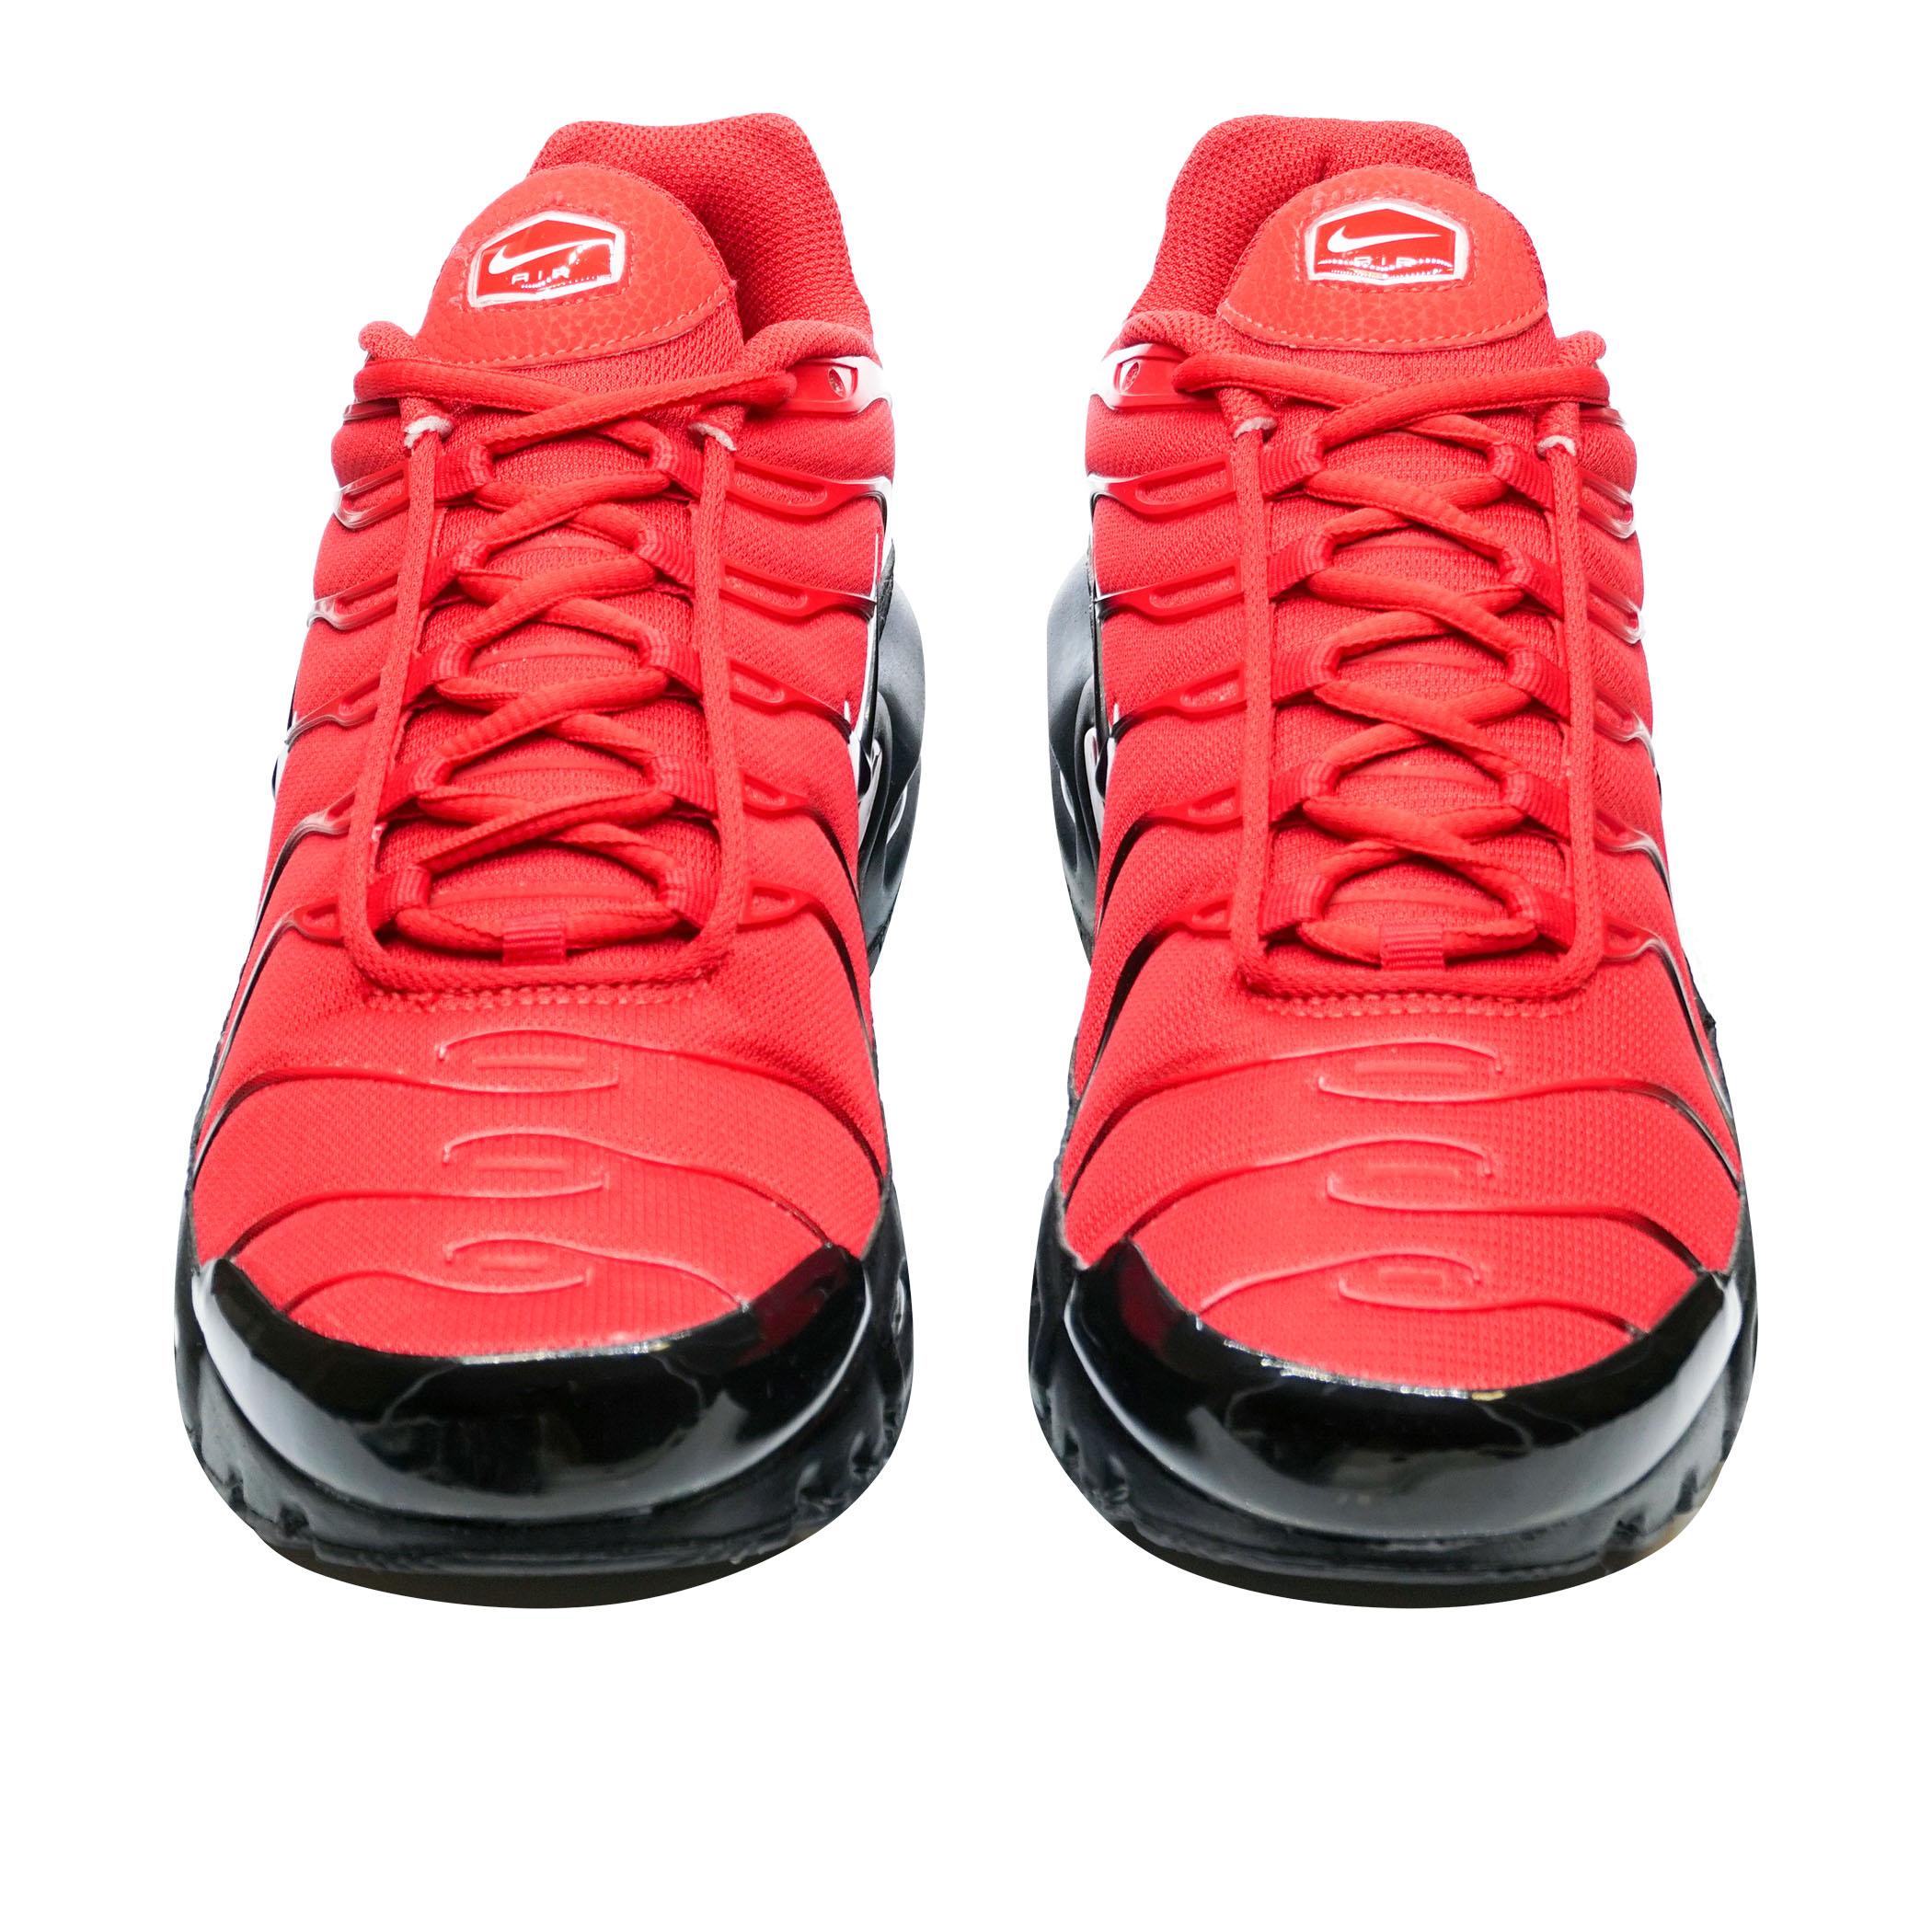 b3c2f739 Мужские кроссовки Nike Air Max Plus University Red/Black-White - фото 3